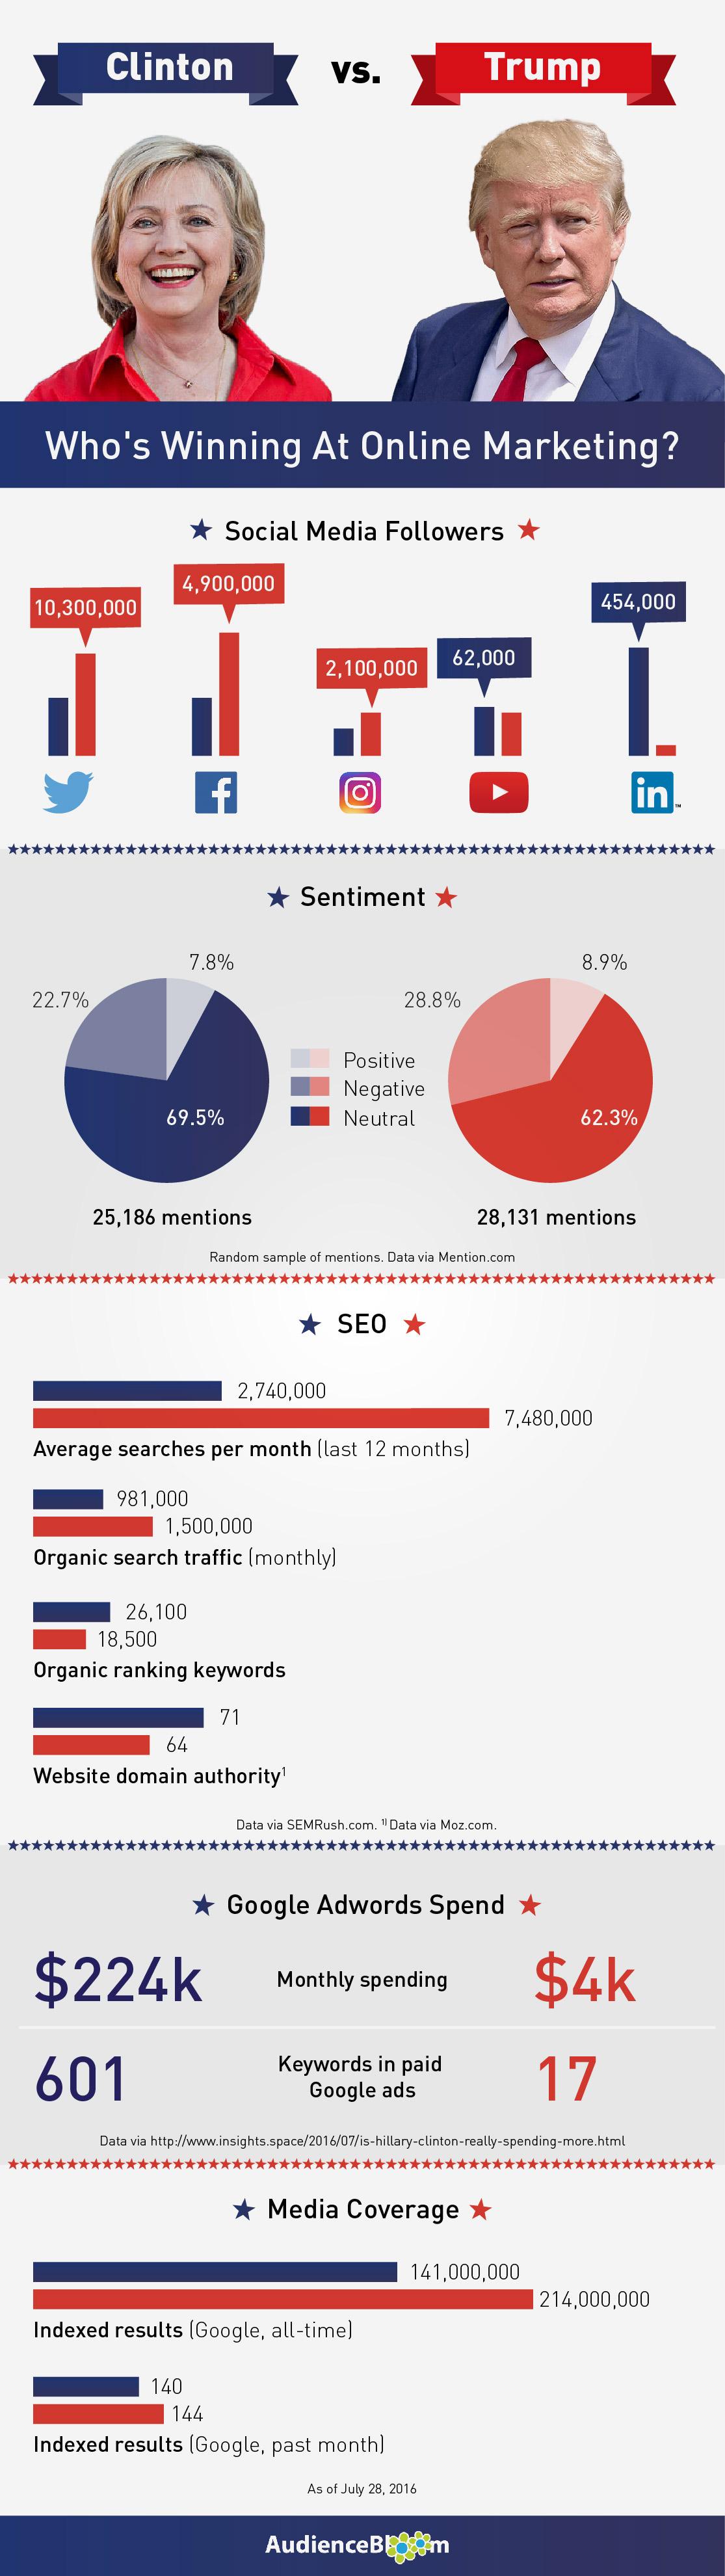 1470420524_clinton-trump-infographic